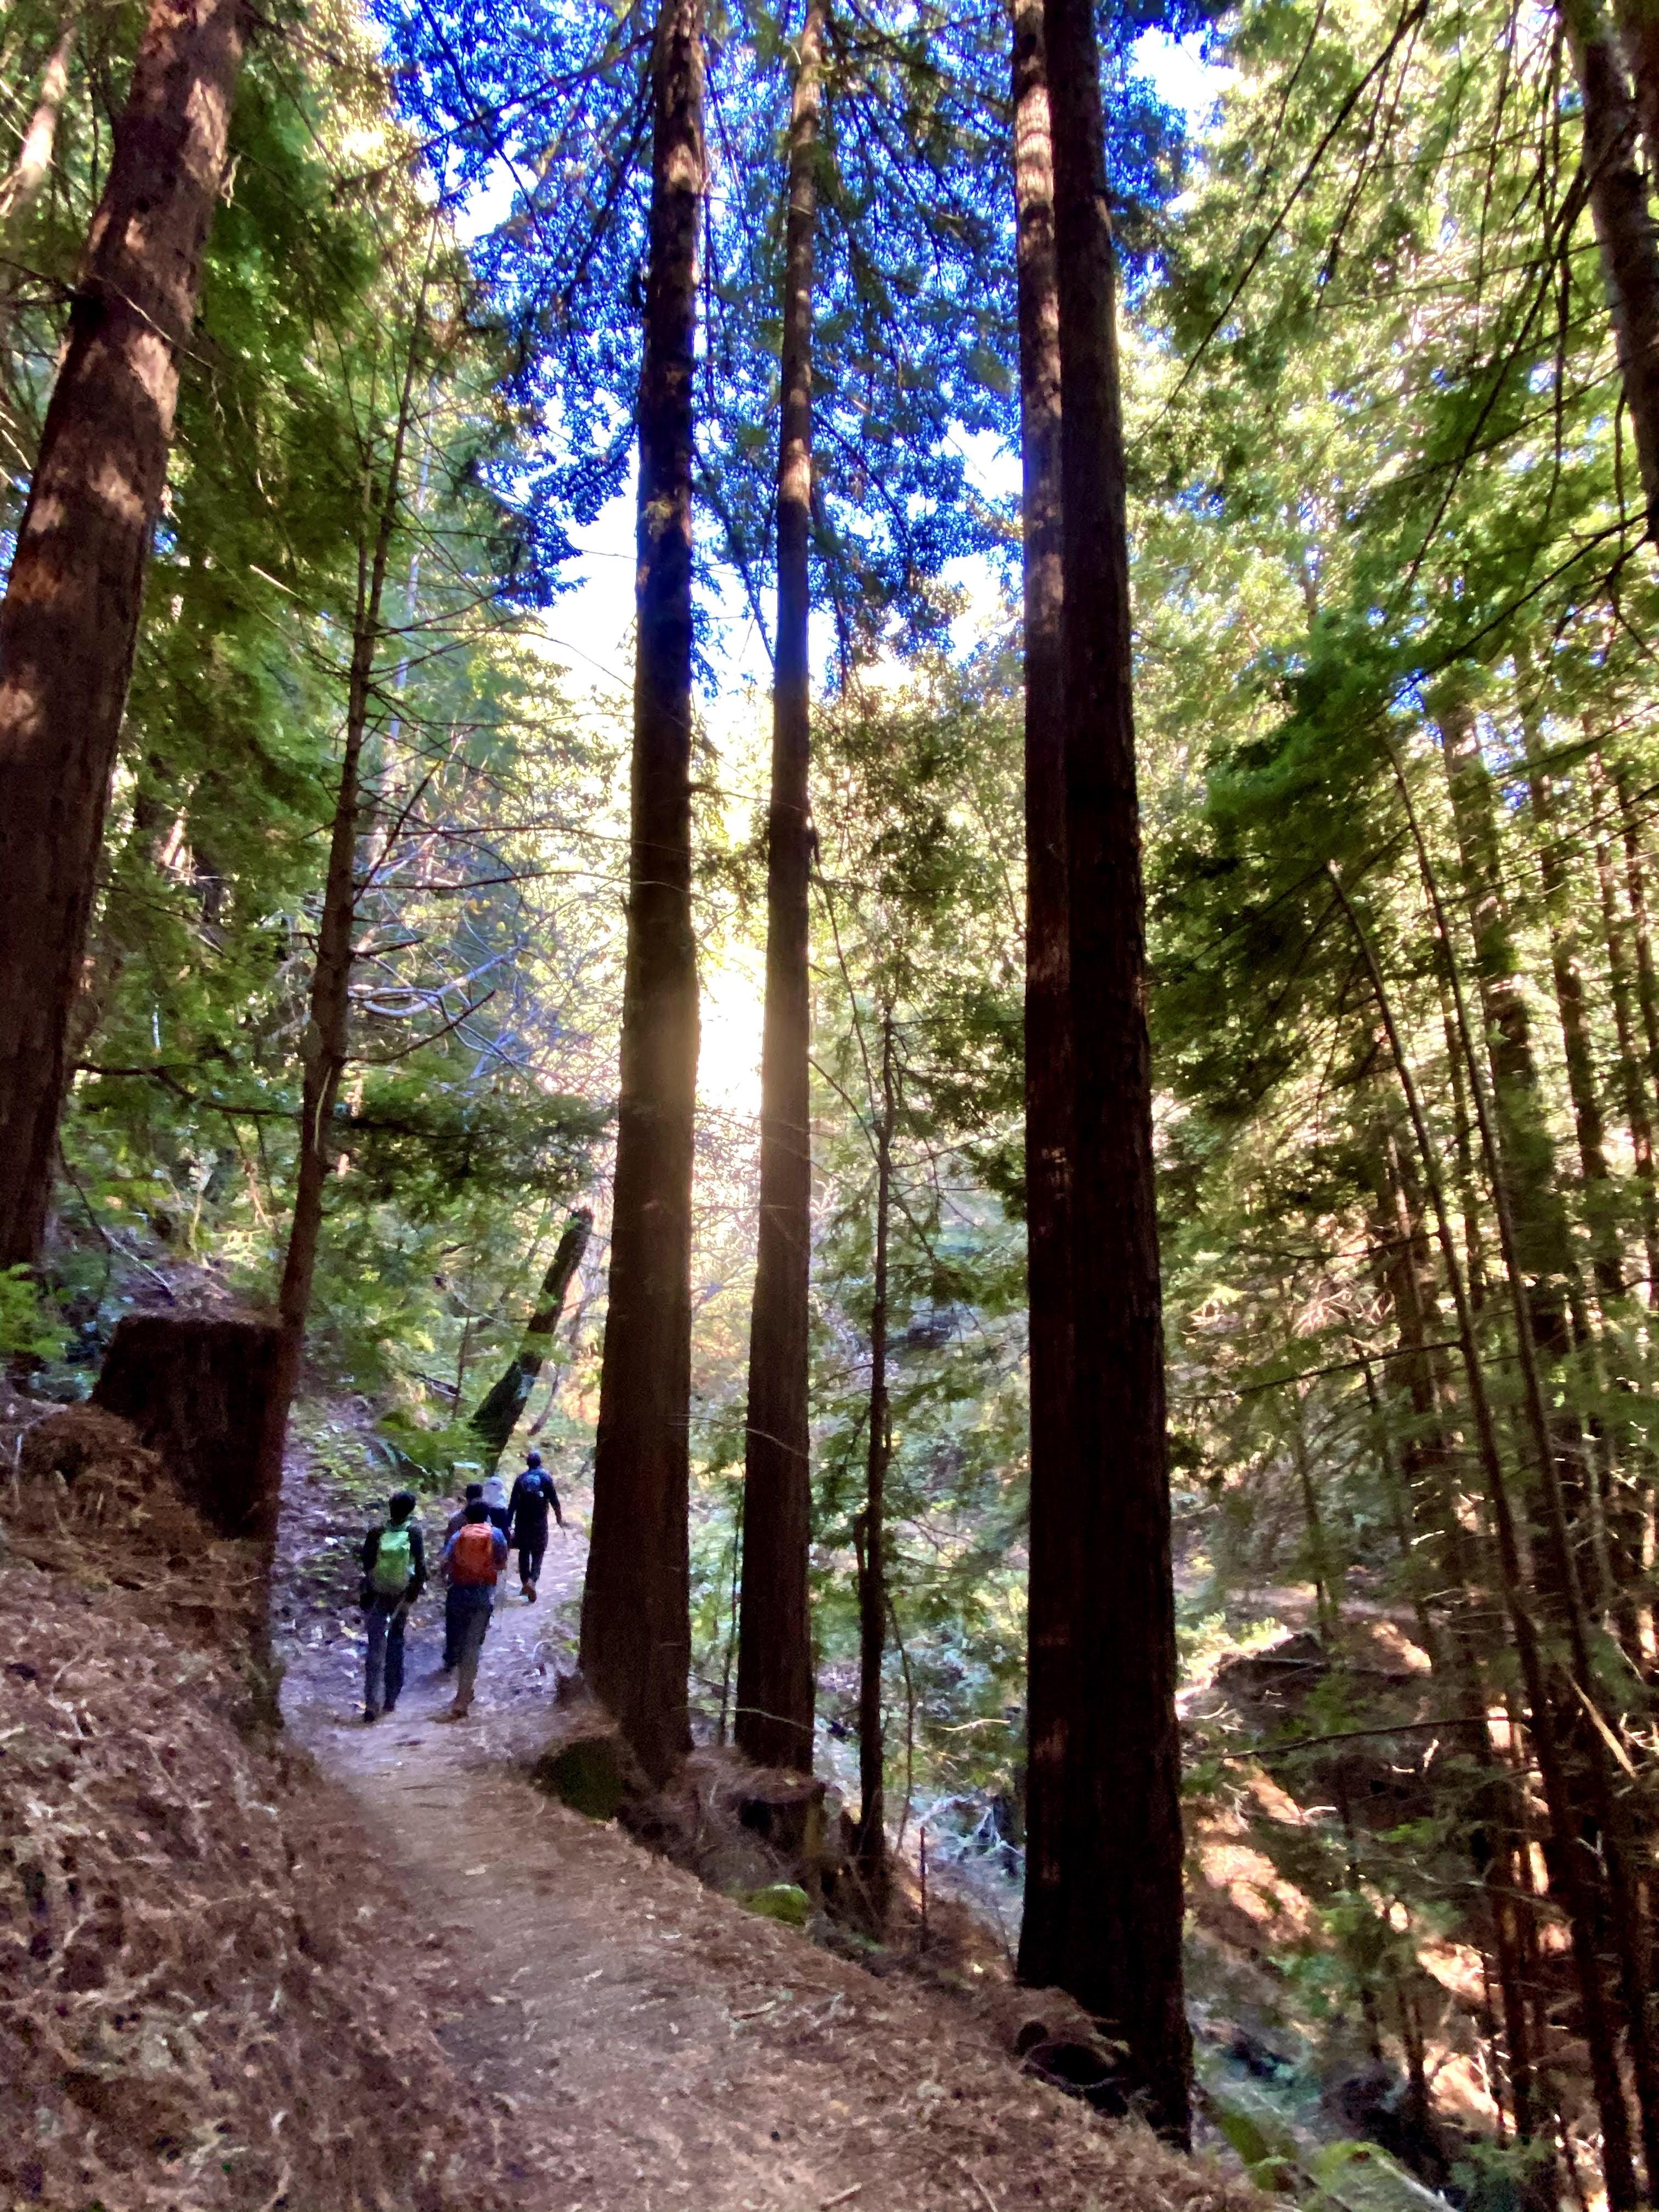 Purisima Coastal Redwoods